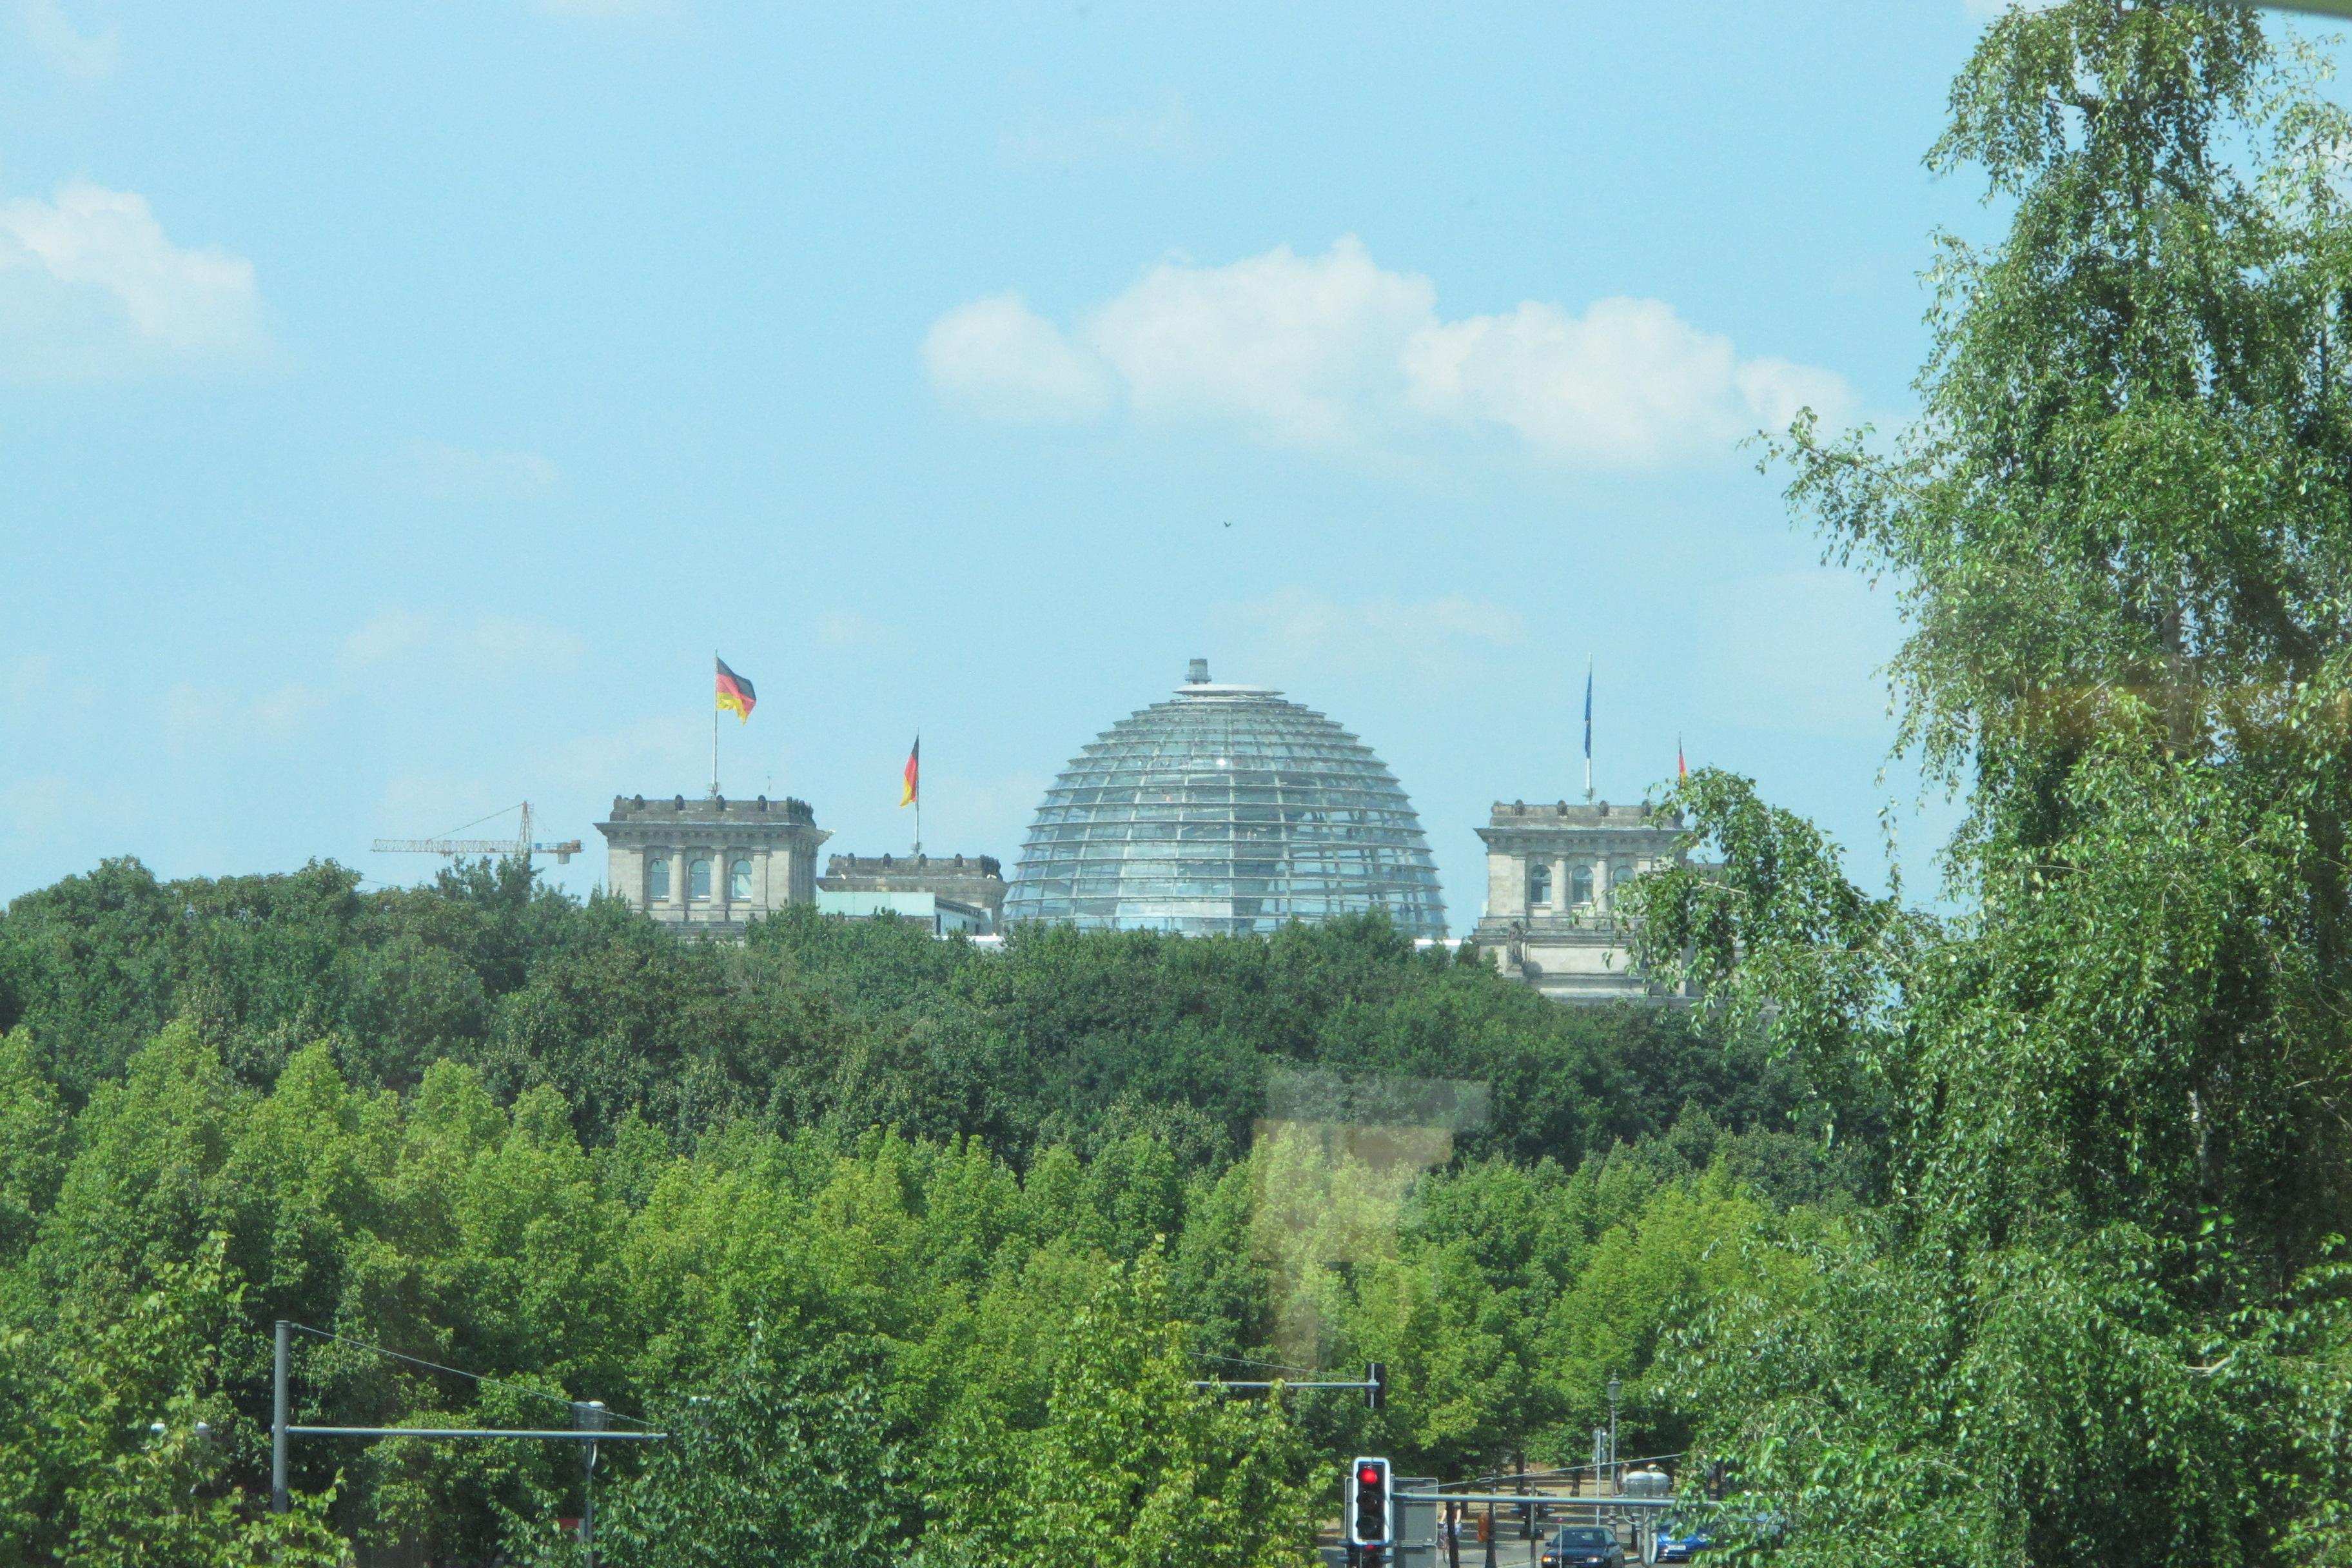 El Reichstag des de el Science Center Medizintechnik Berlin, a través de les finestres